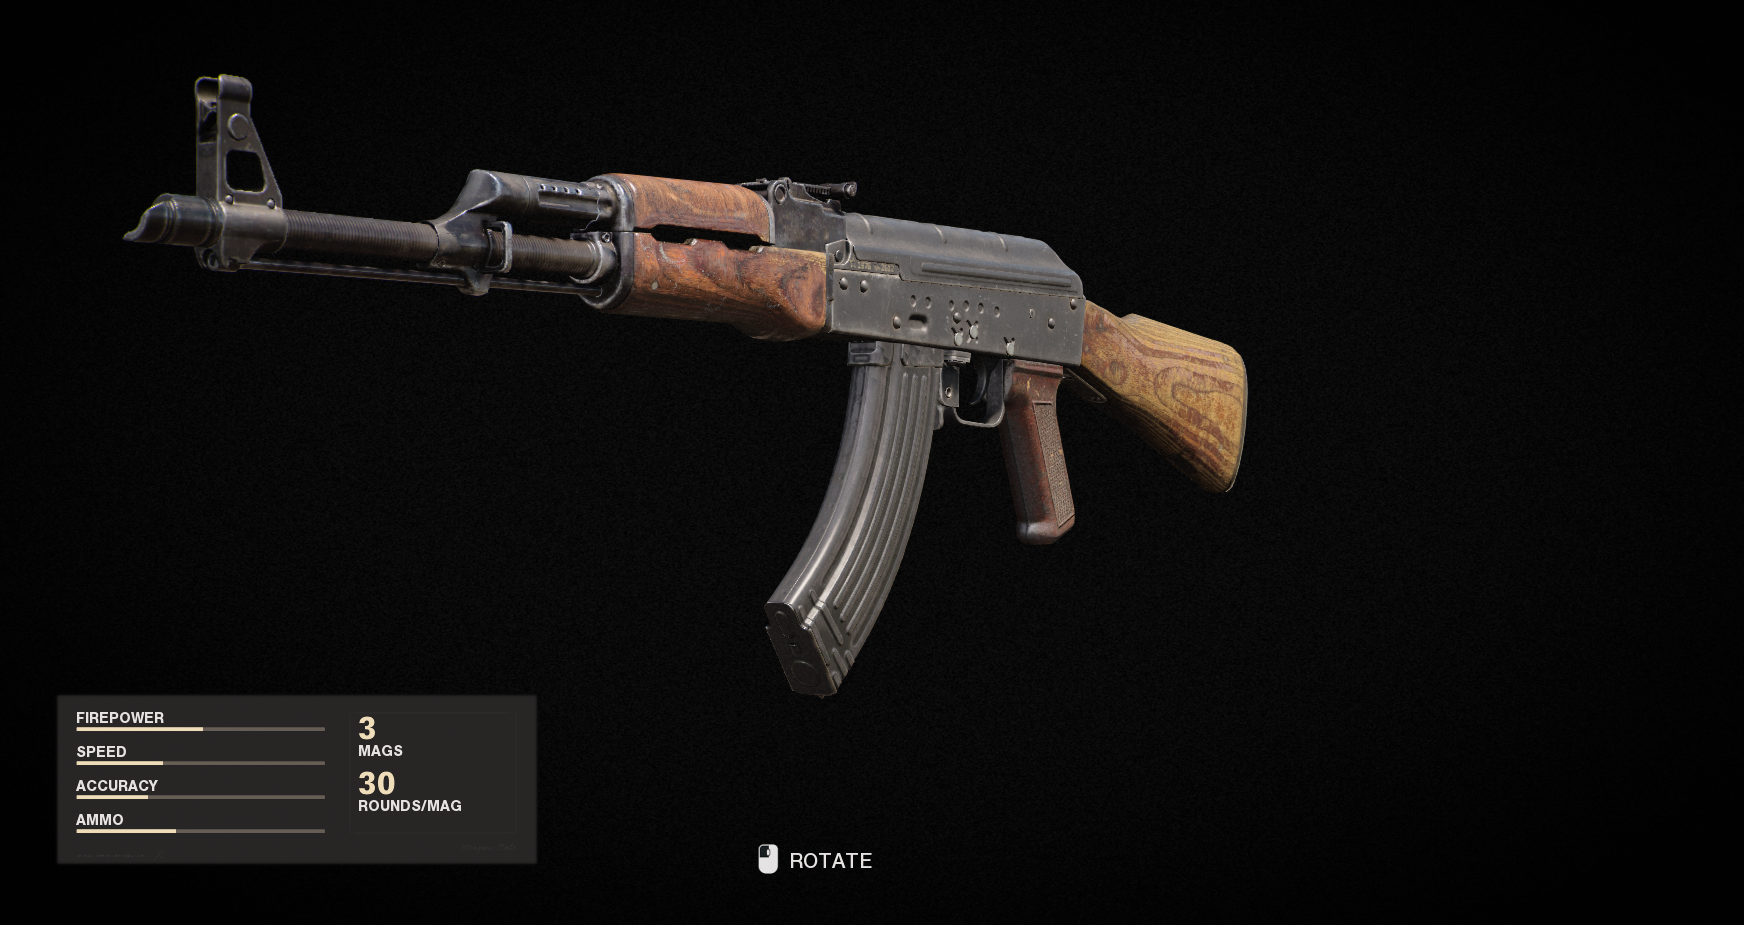 Call of Duty: meilleure configuration AK-47 dans Black Ops Cold War